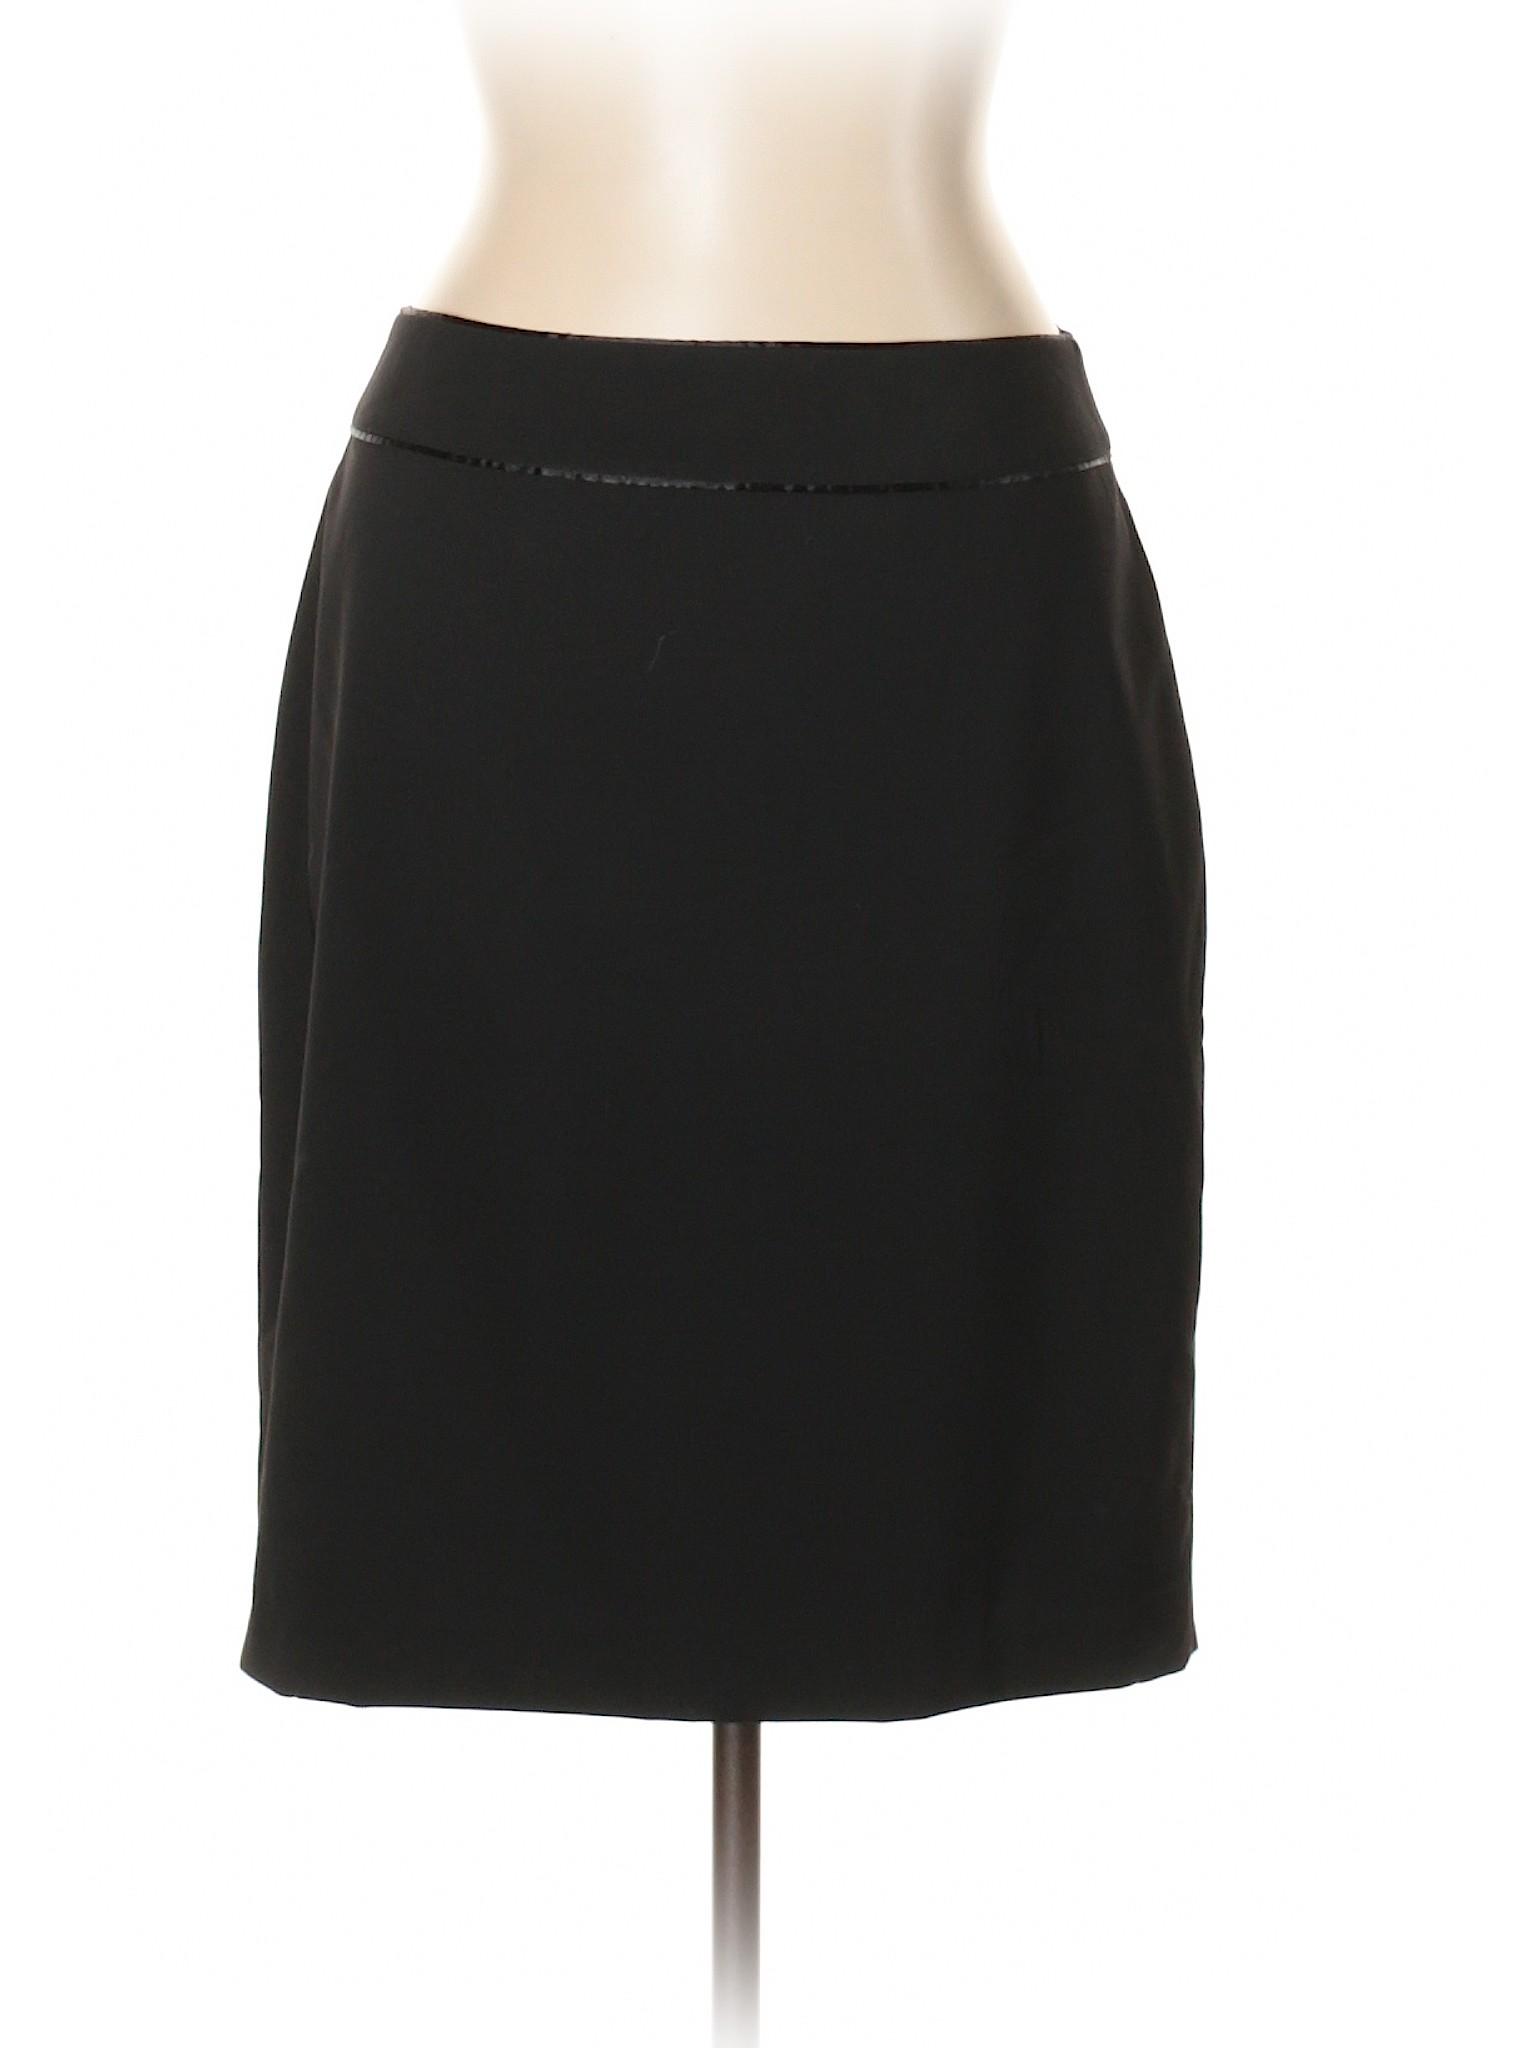 Vineyard Boutique Vines Skirt Casual leisure xzF70n1q4w